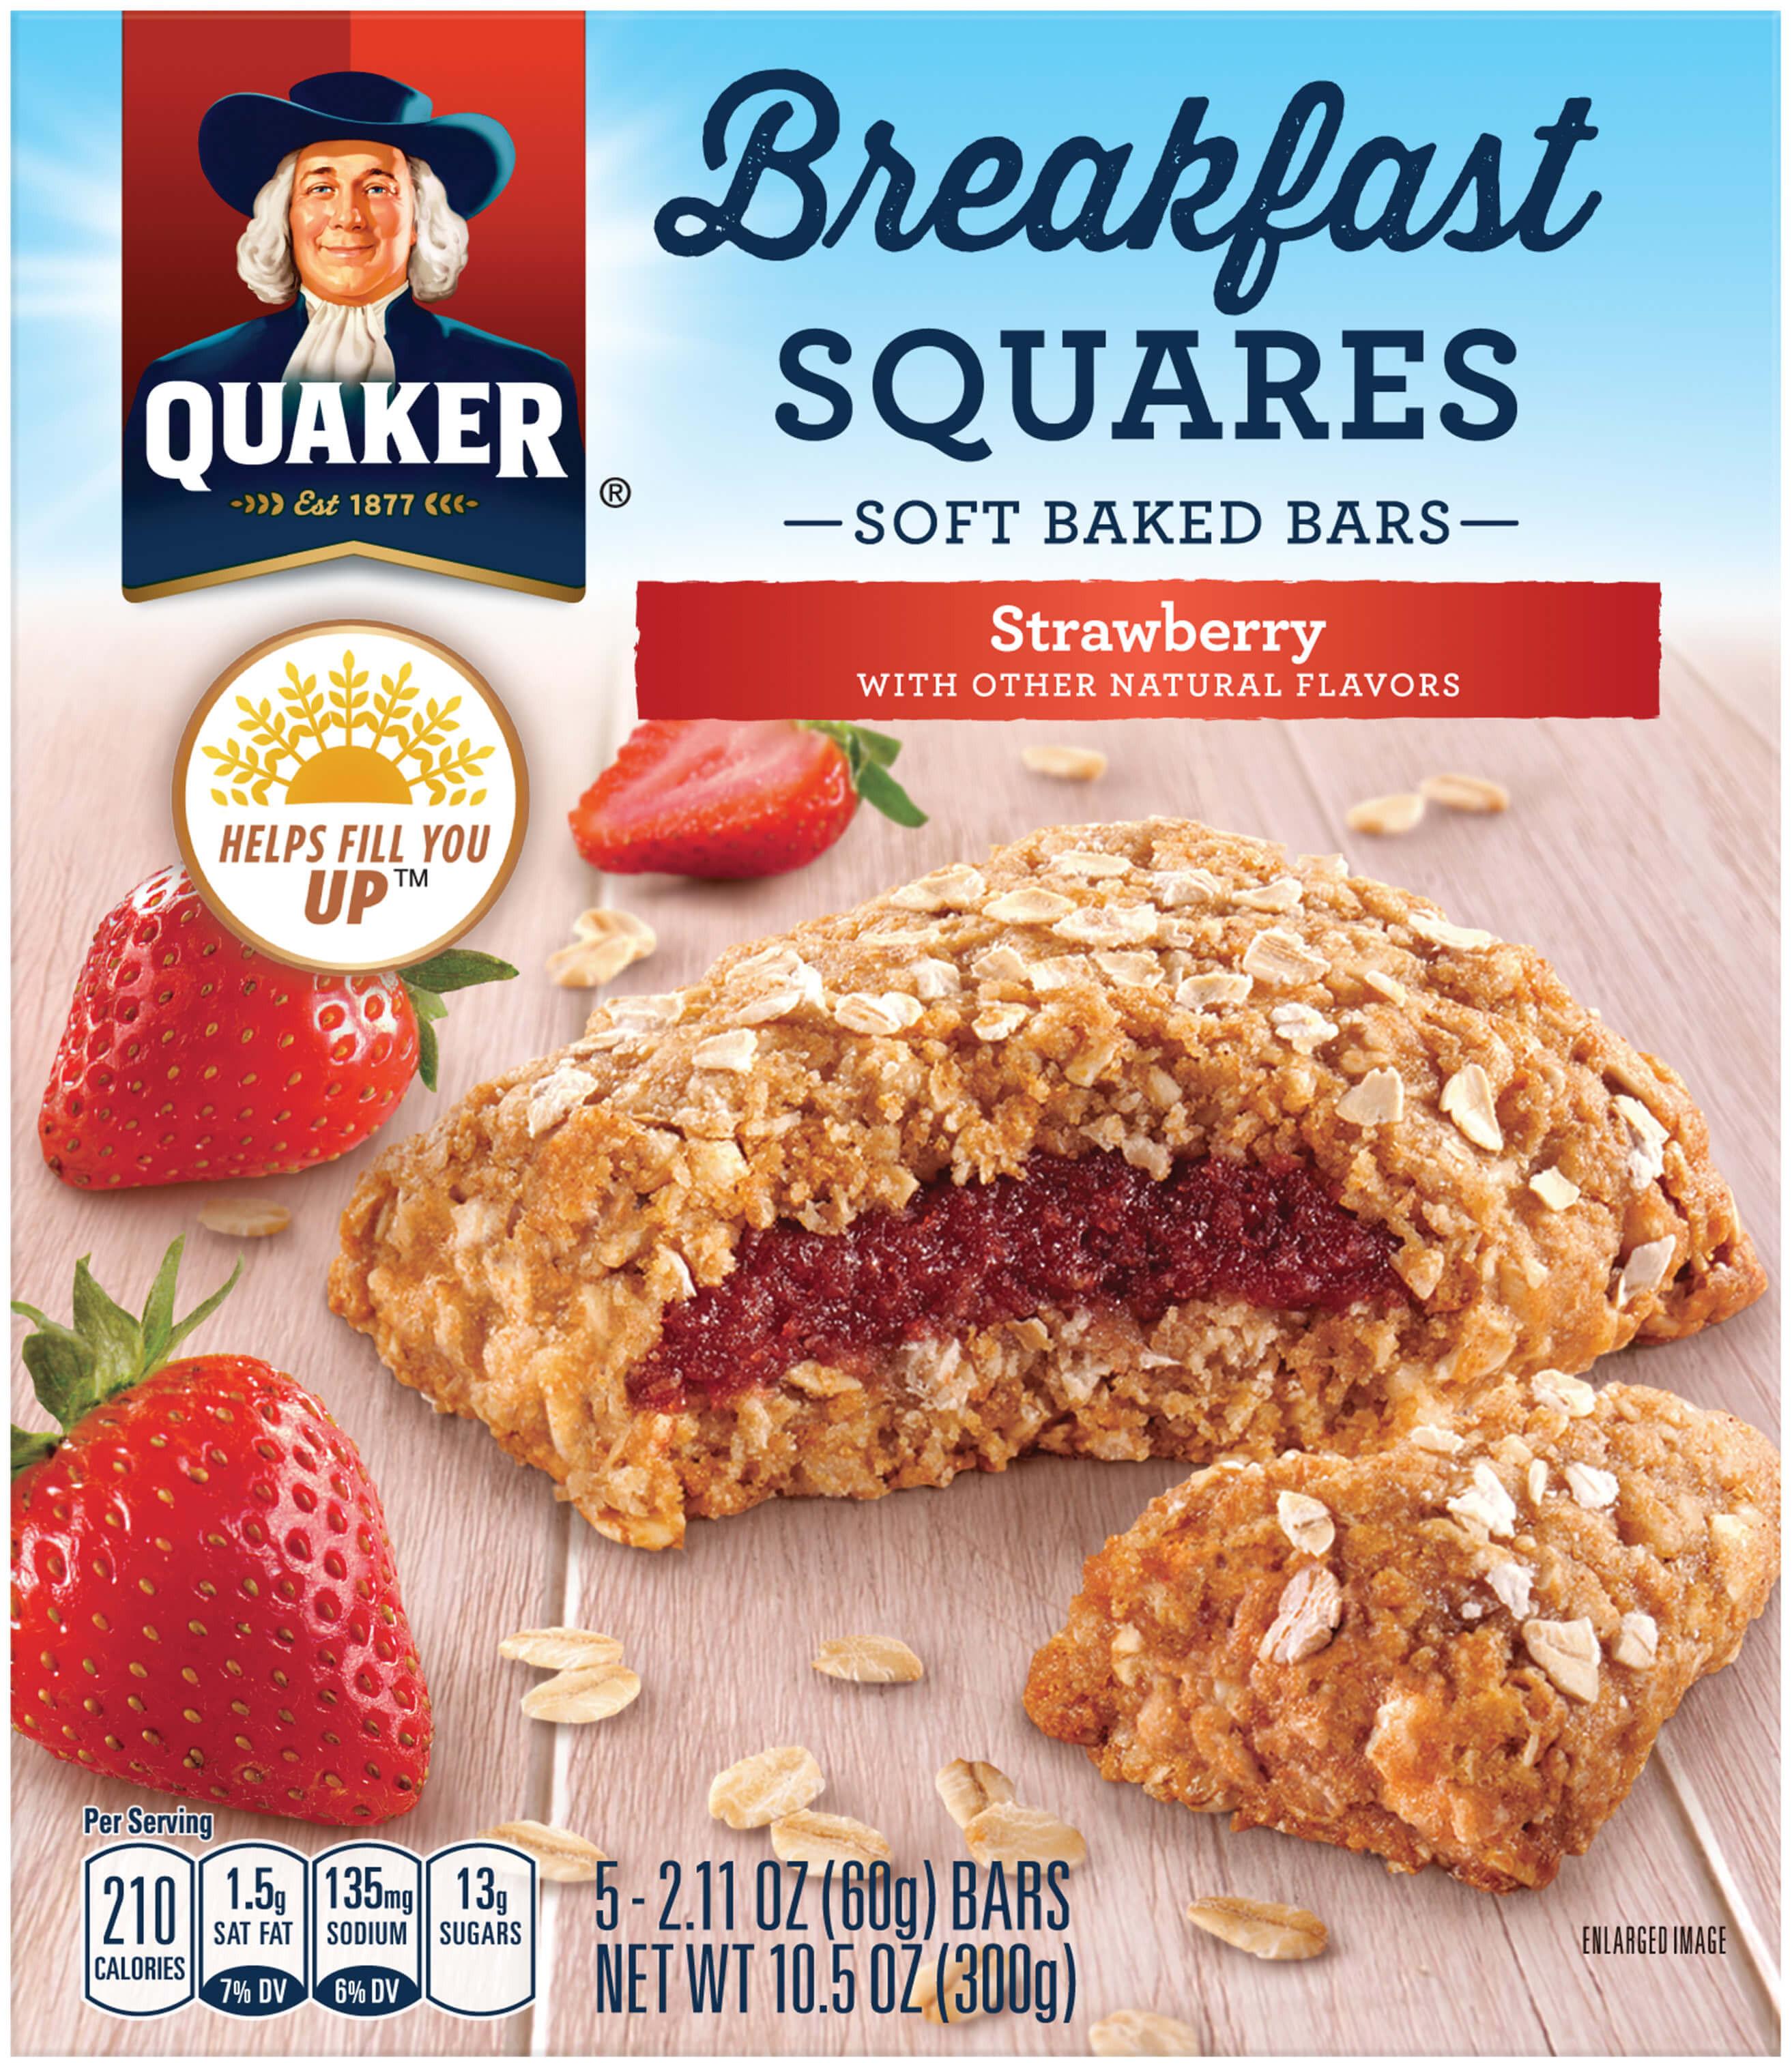 Quaker Oats Breakfast Recipes  Quaker Breakfast Squares Strawberry